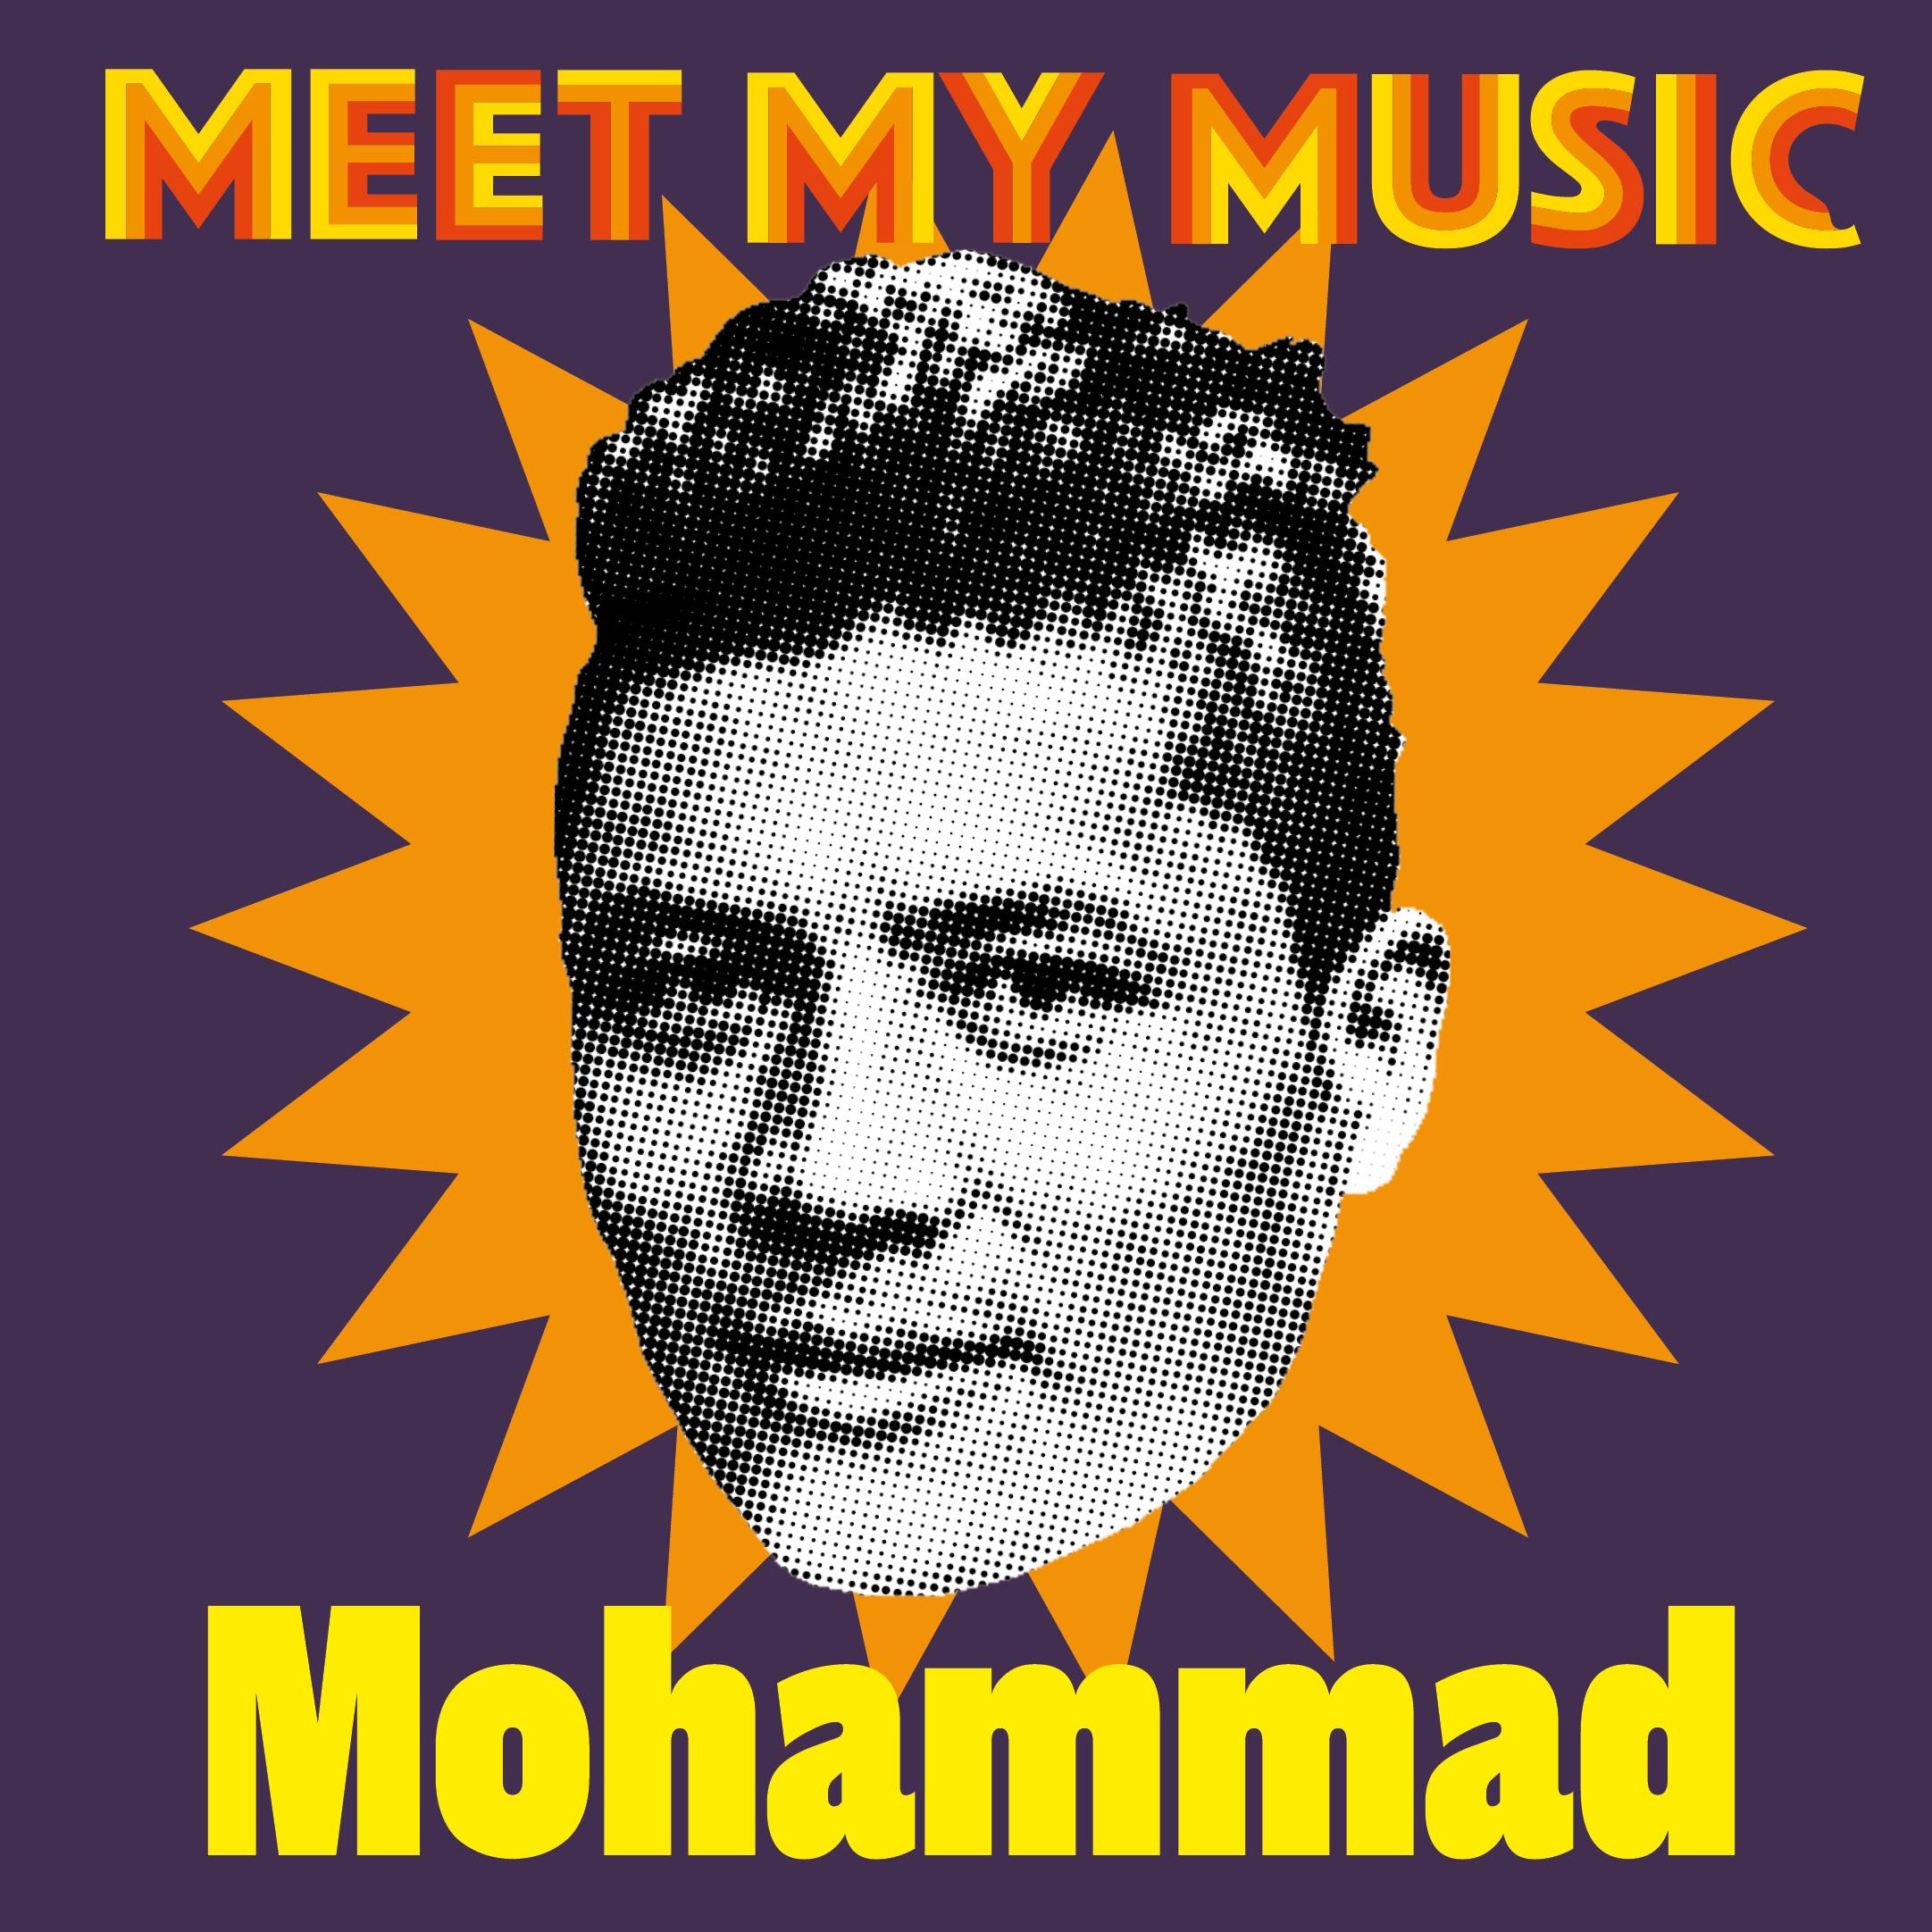 Meet my music Mohammad 185.jpg